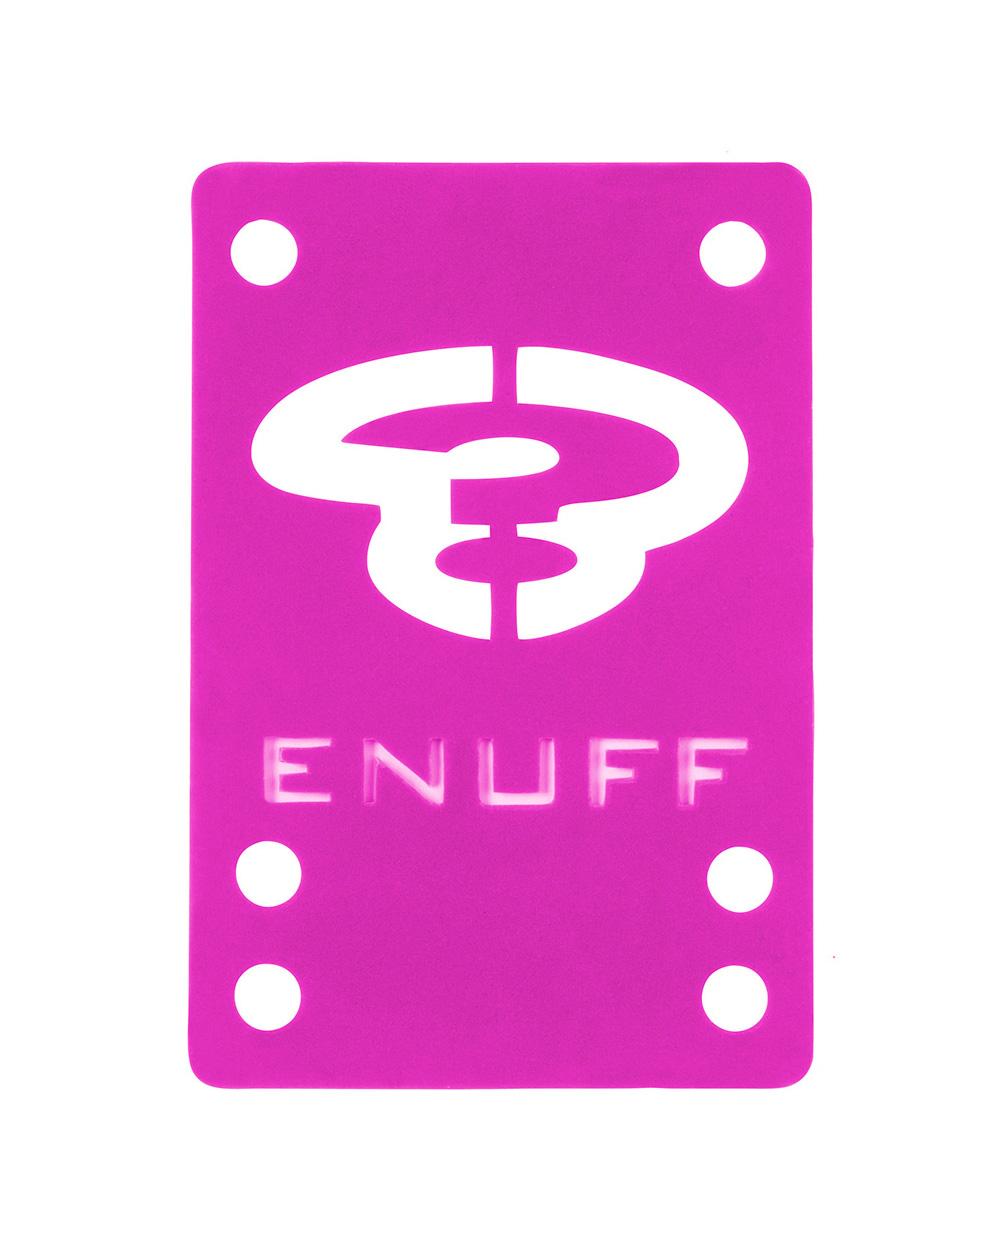 Enuff Shock 1mm Risers Pink pack of 2